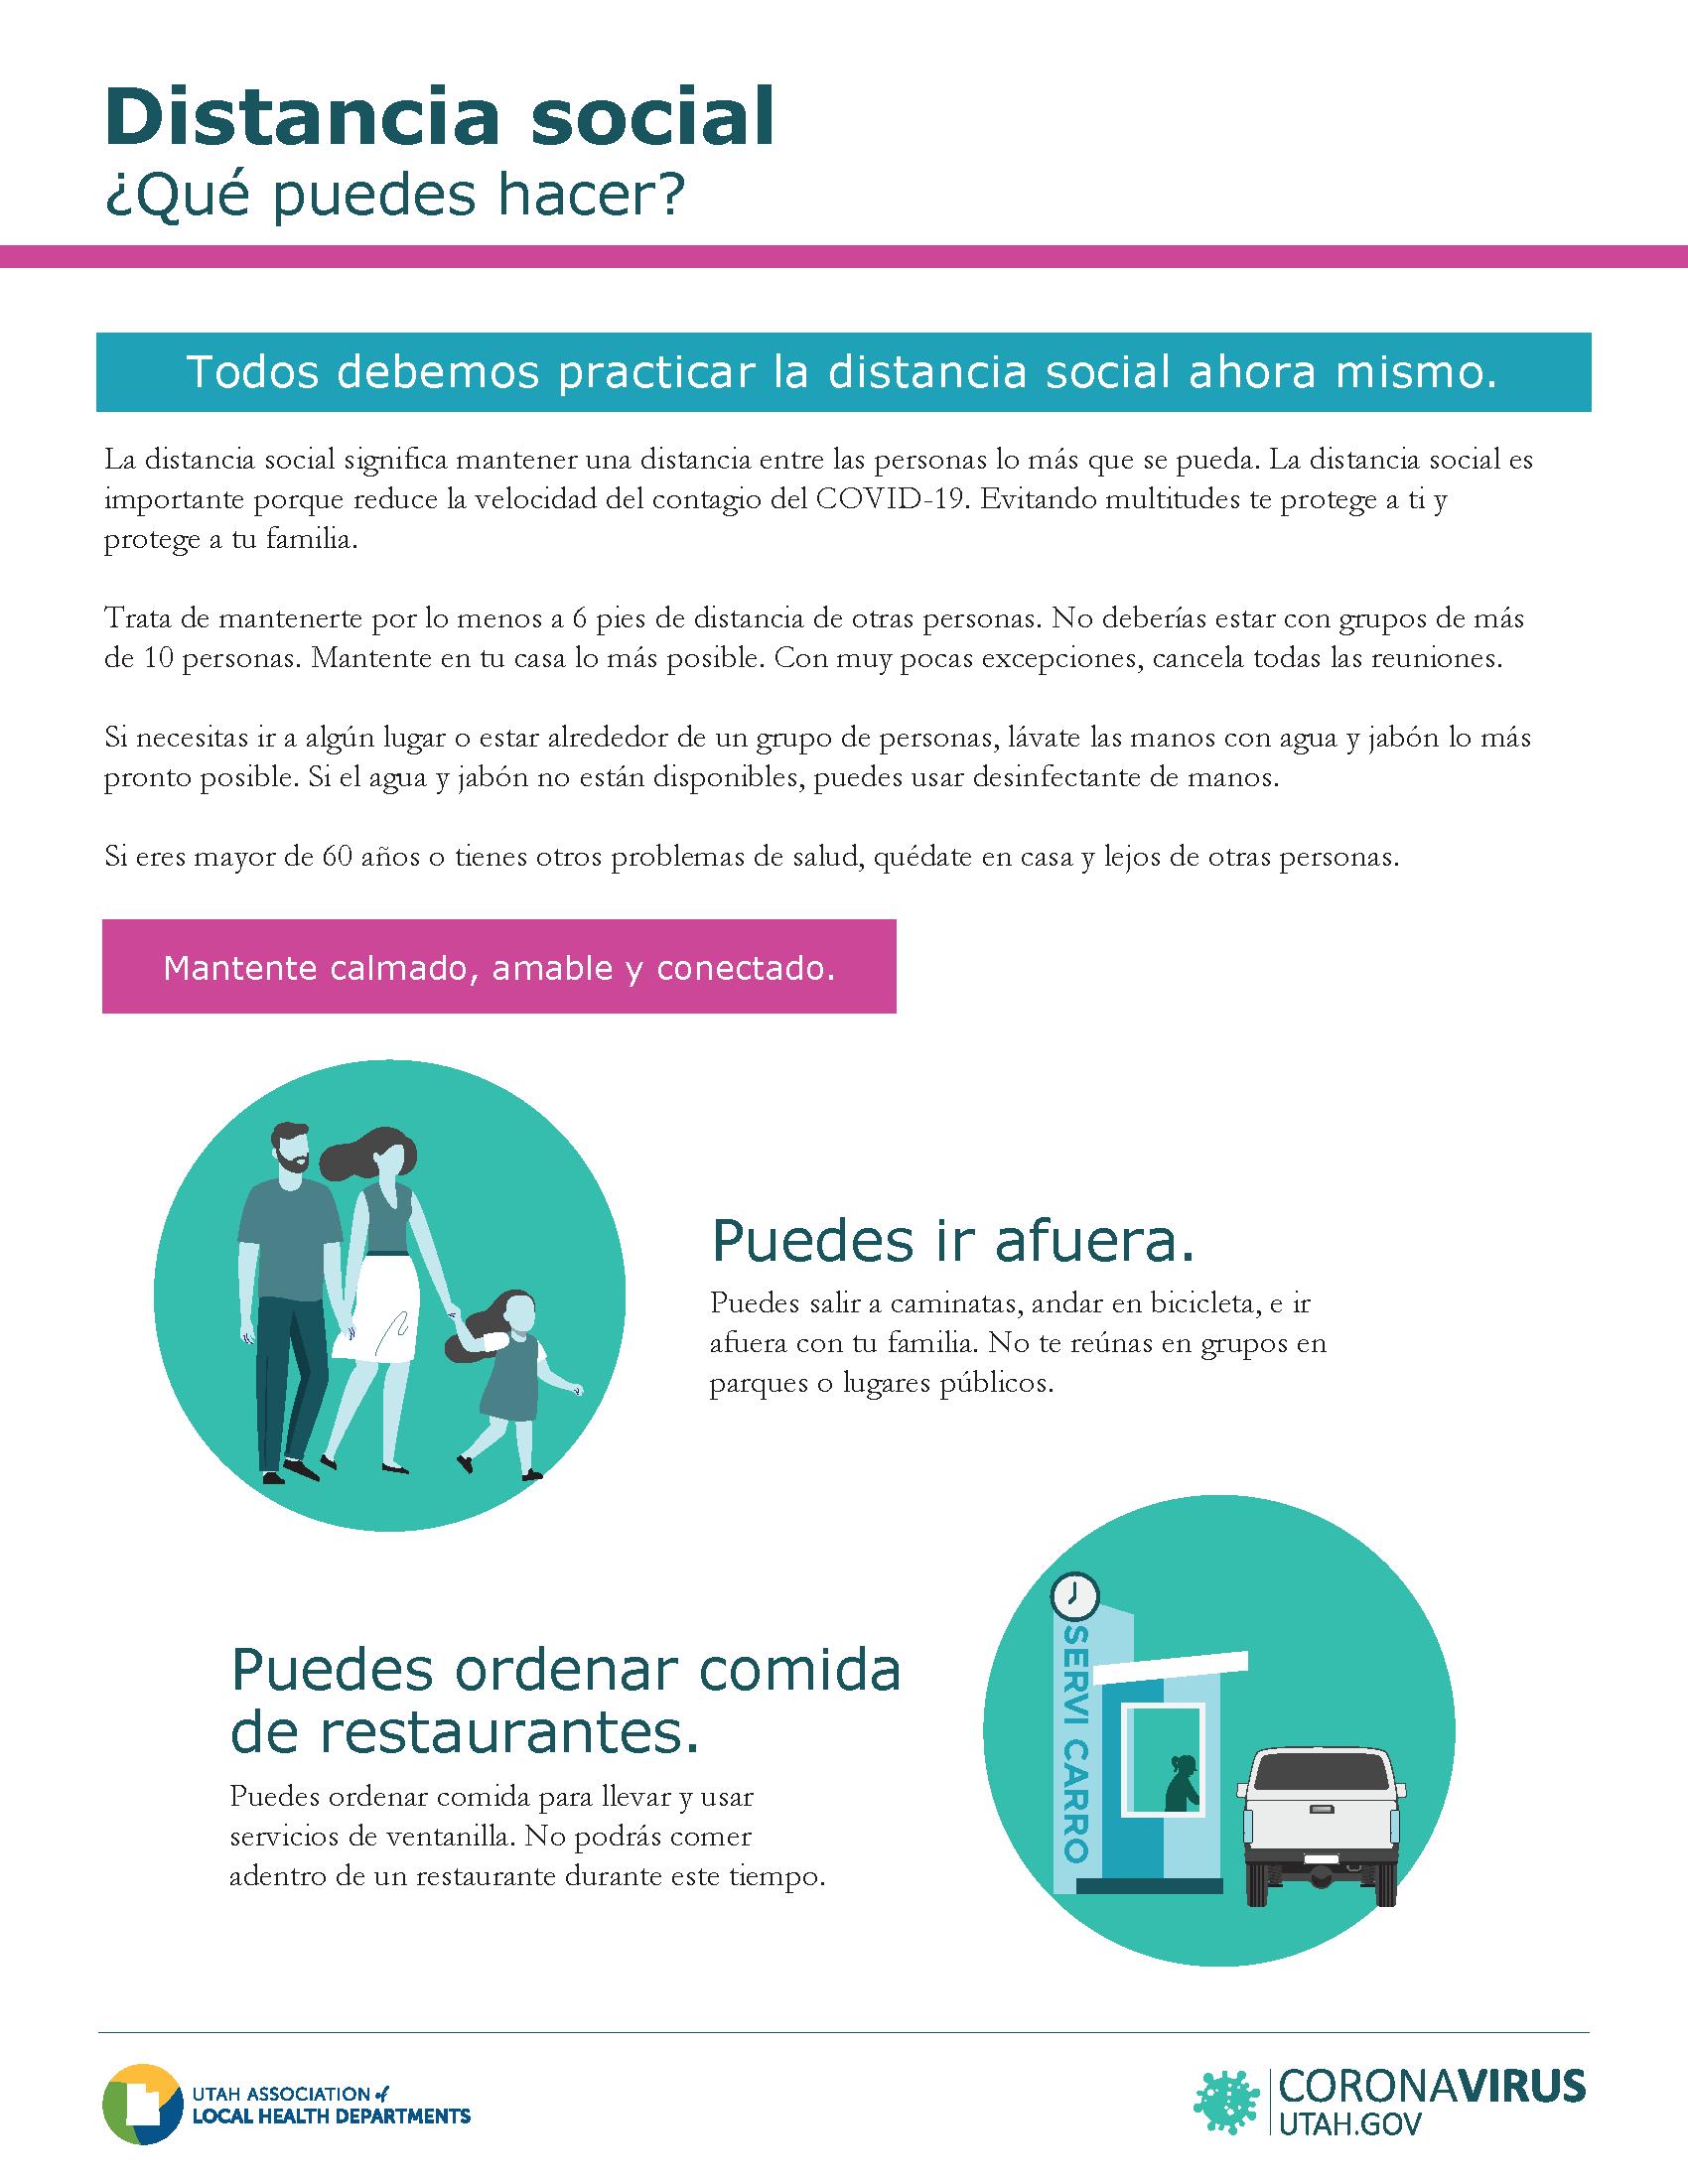 Spanish Social Distancing